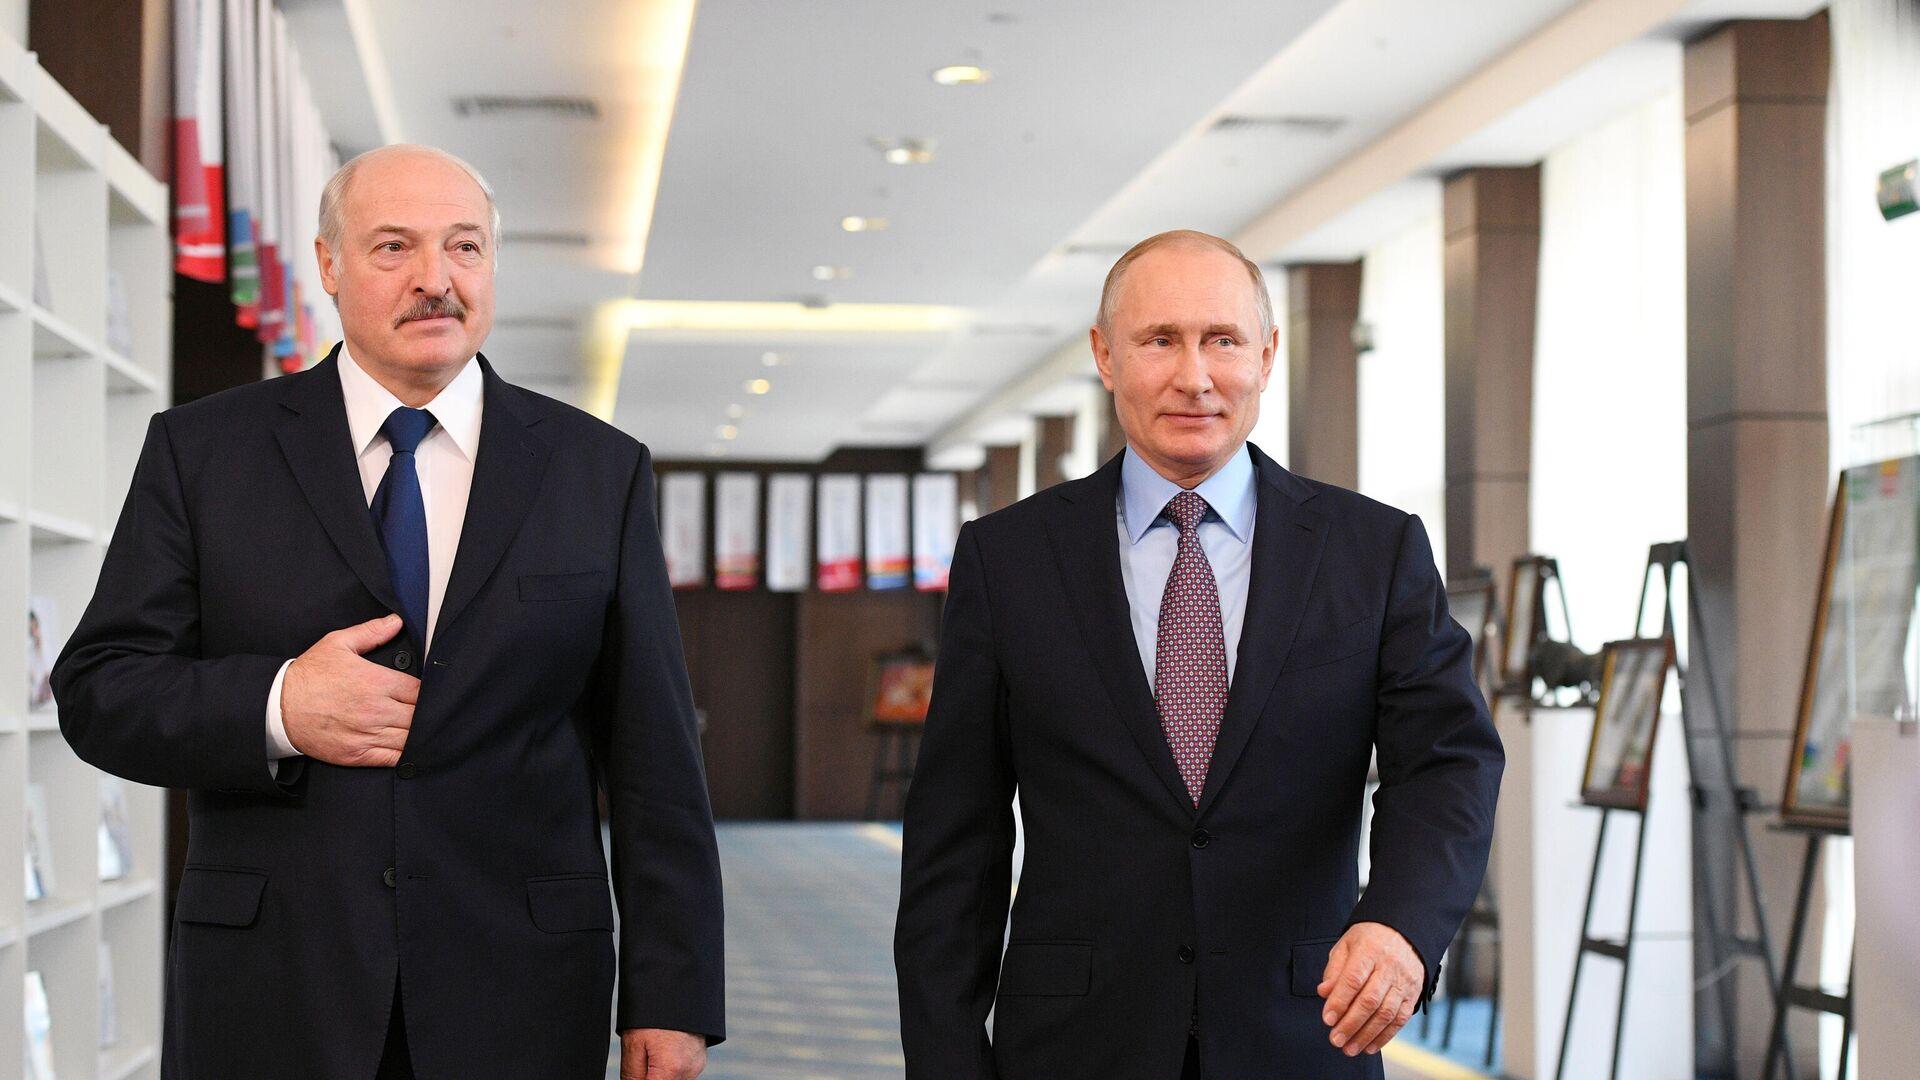 Президент РФ Владимир Путин и президент Белоруссии Александр Лукашенко - РИА Новости, 1920, 24.09.2020